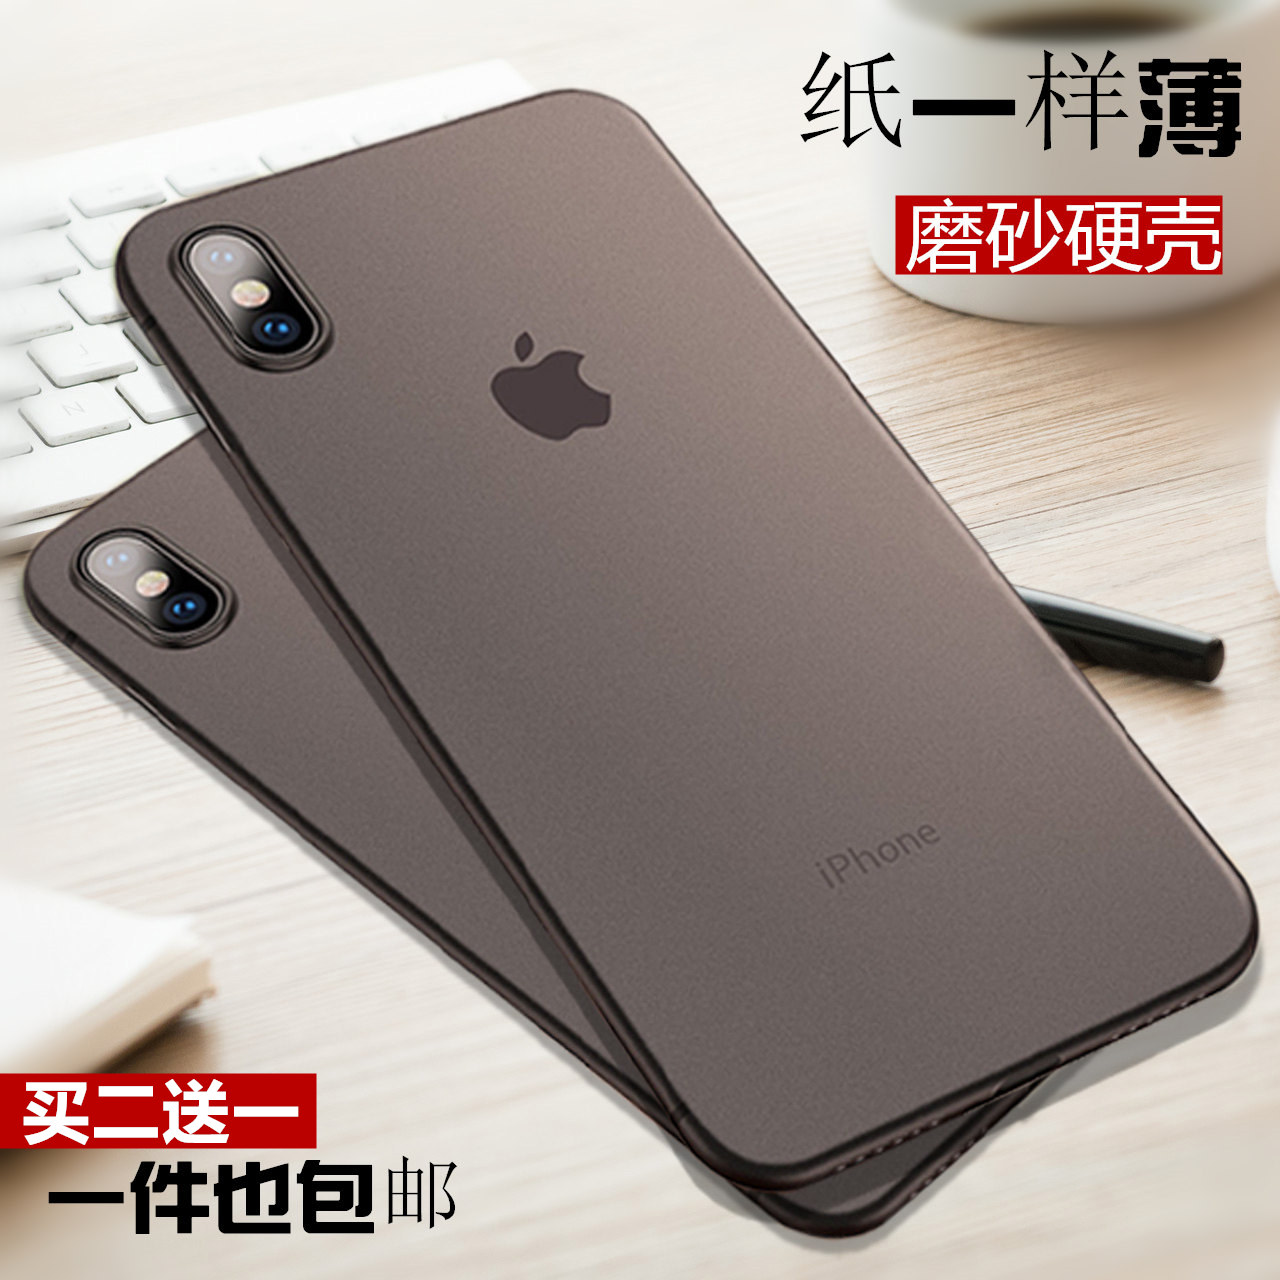 iphonex手机壳全包磨砂硬壳透明6splus超薄苹果7防摔8保护套9潮牌